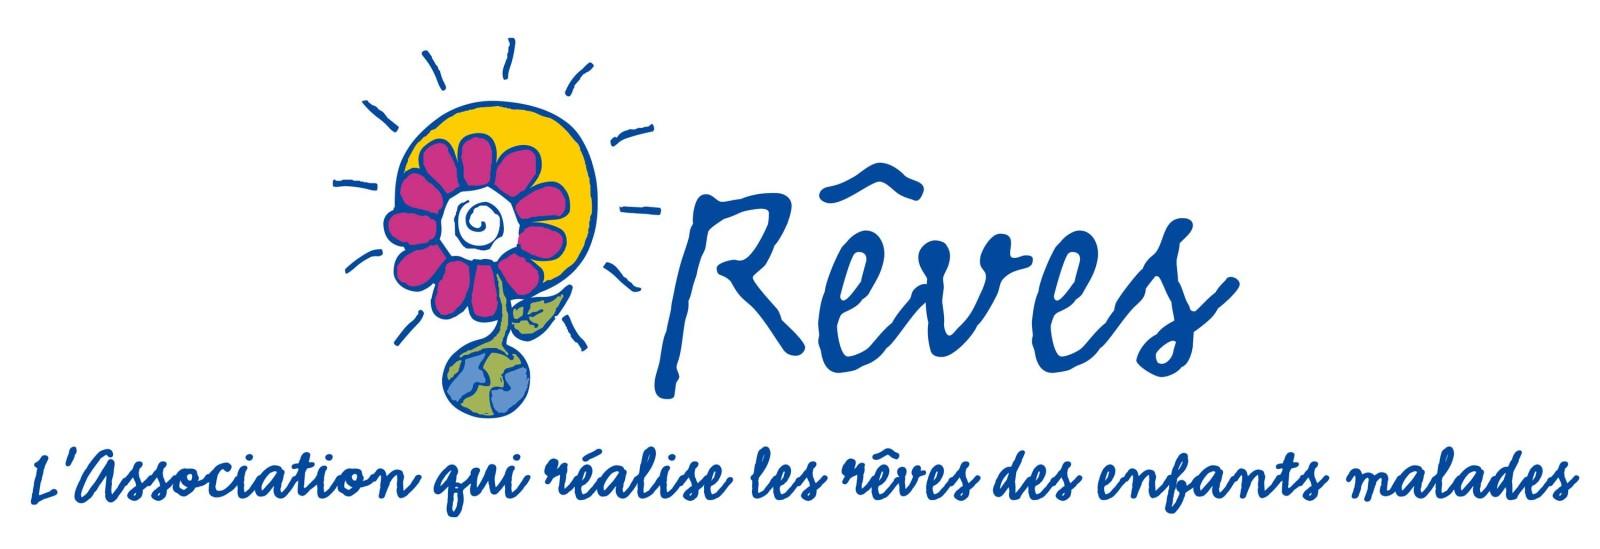 https://quichottine.fr/wp-content/uploads/2011/11/Logo-slogan-coul.jpg